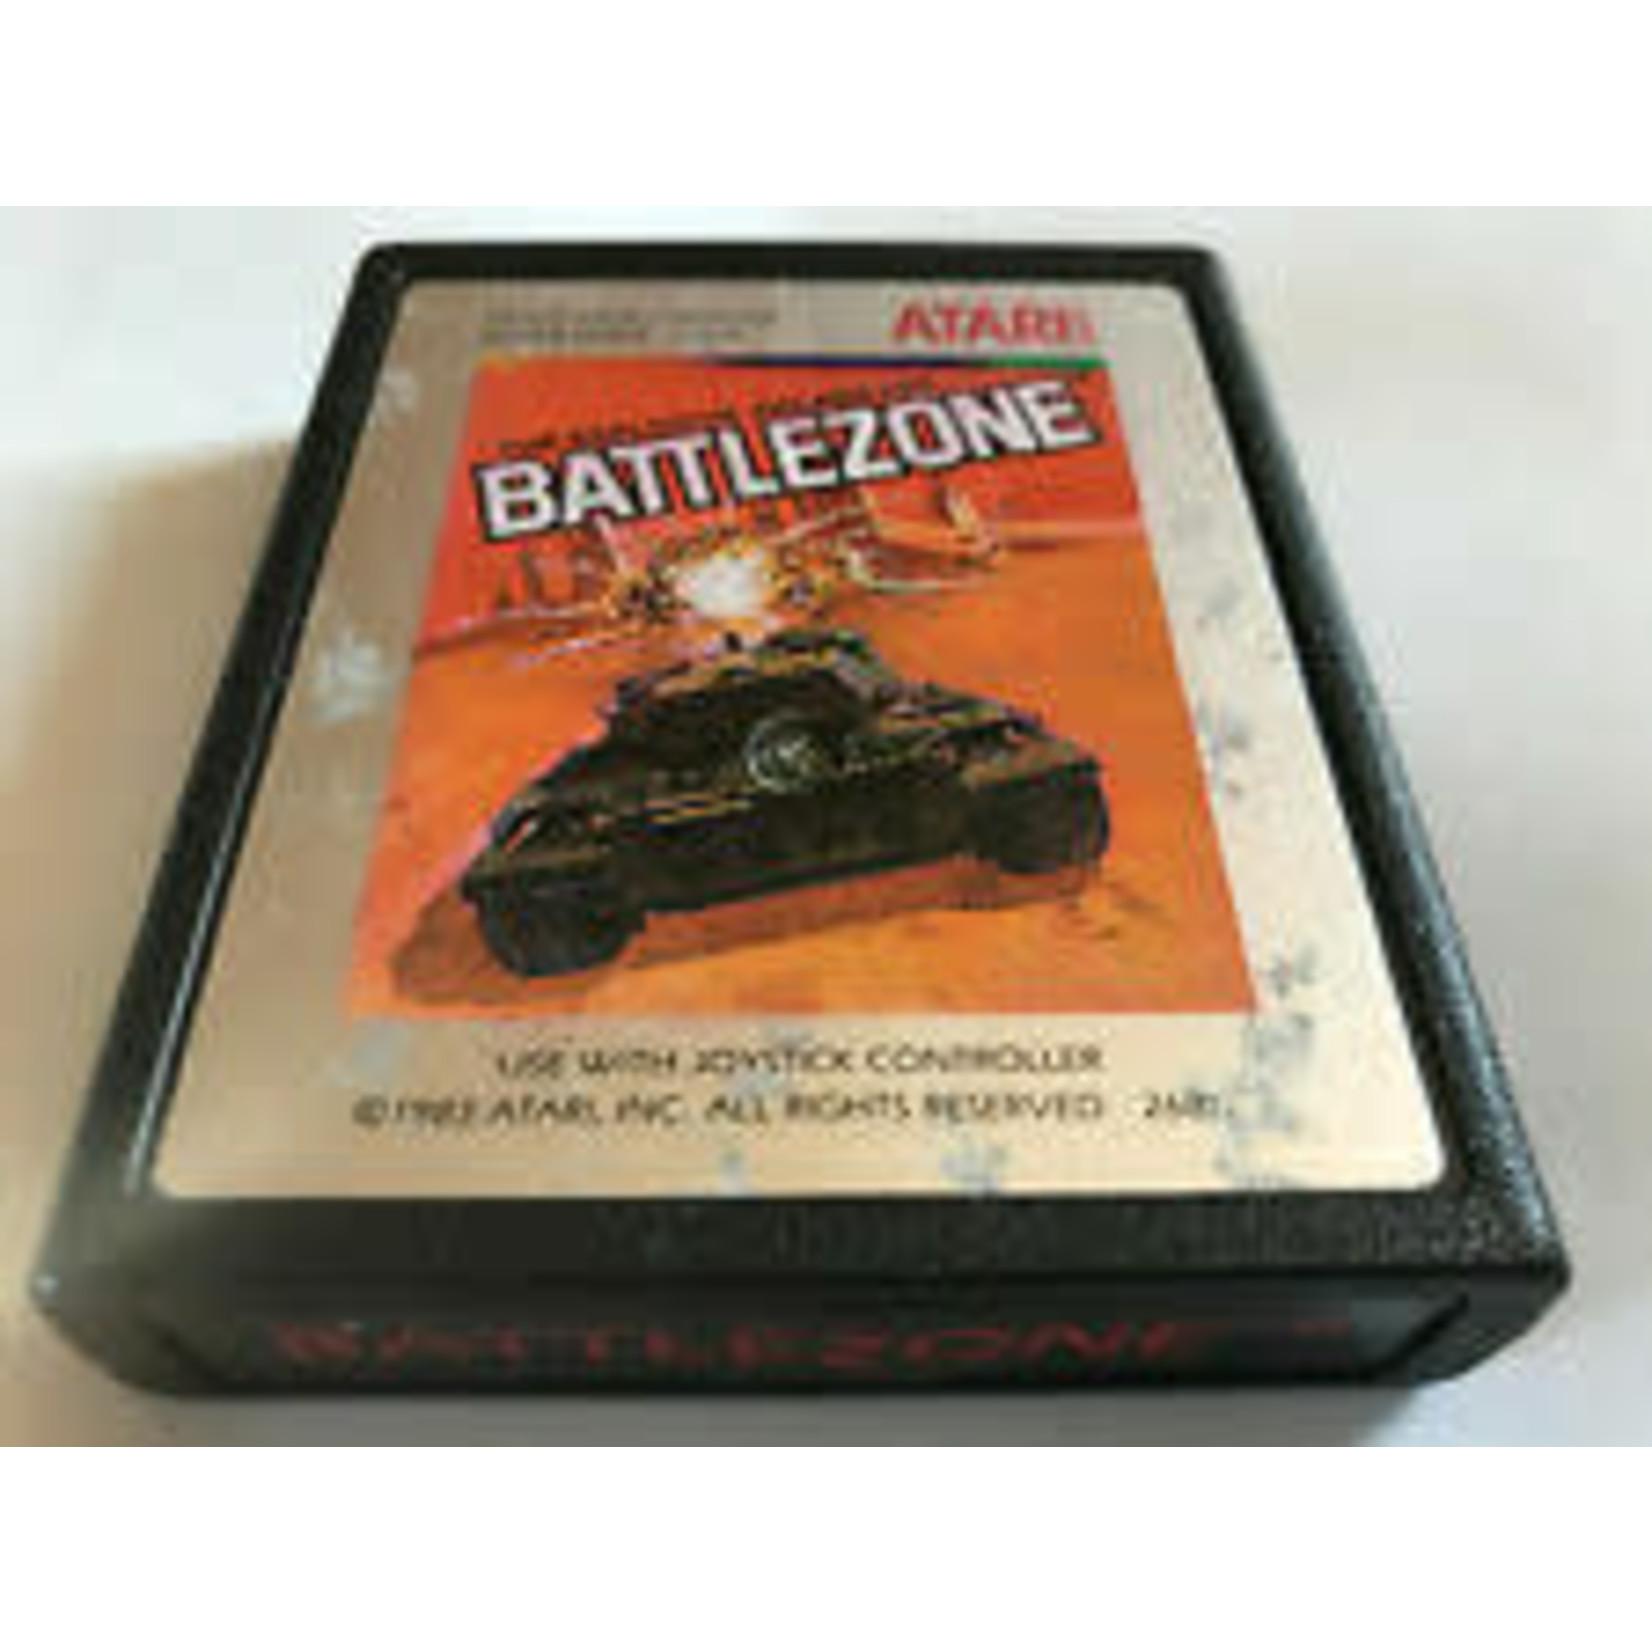 atariu-Battlezone (cart only)